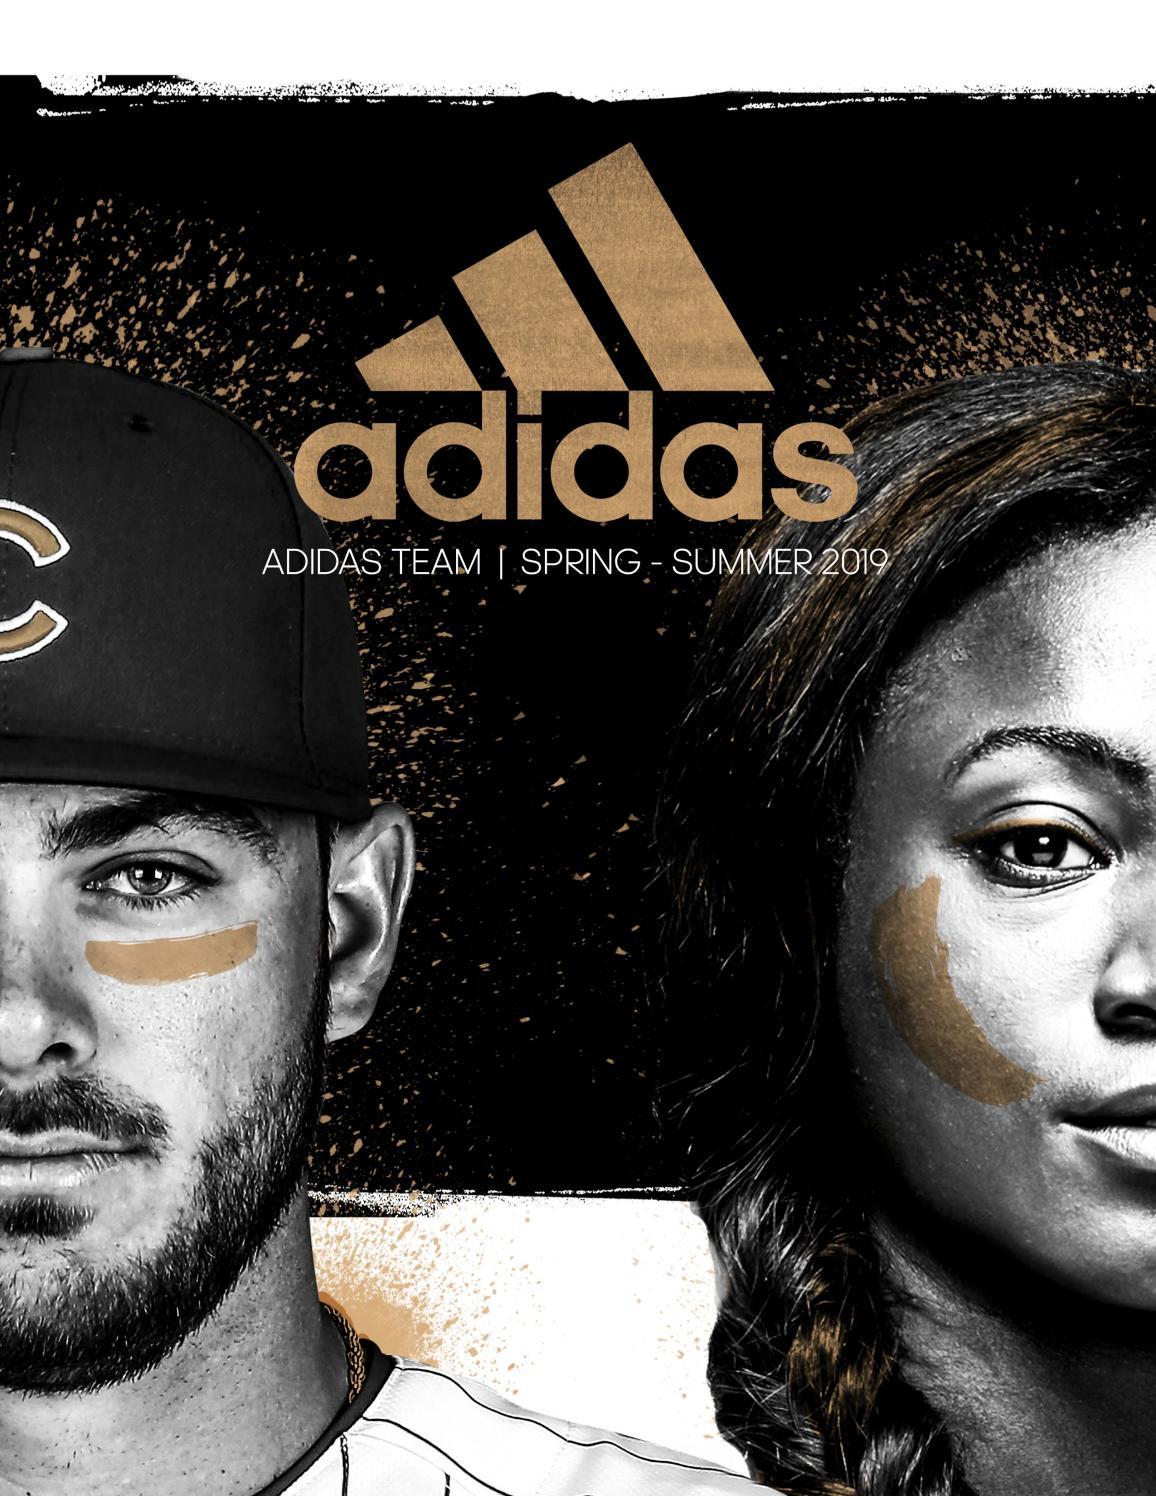 Adidas Catalogue Team Été 2019 by influencesport - issuu